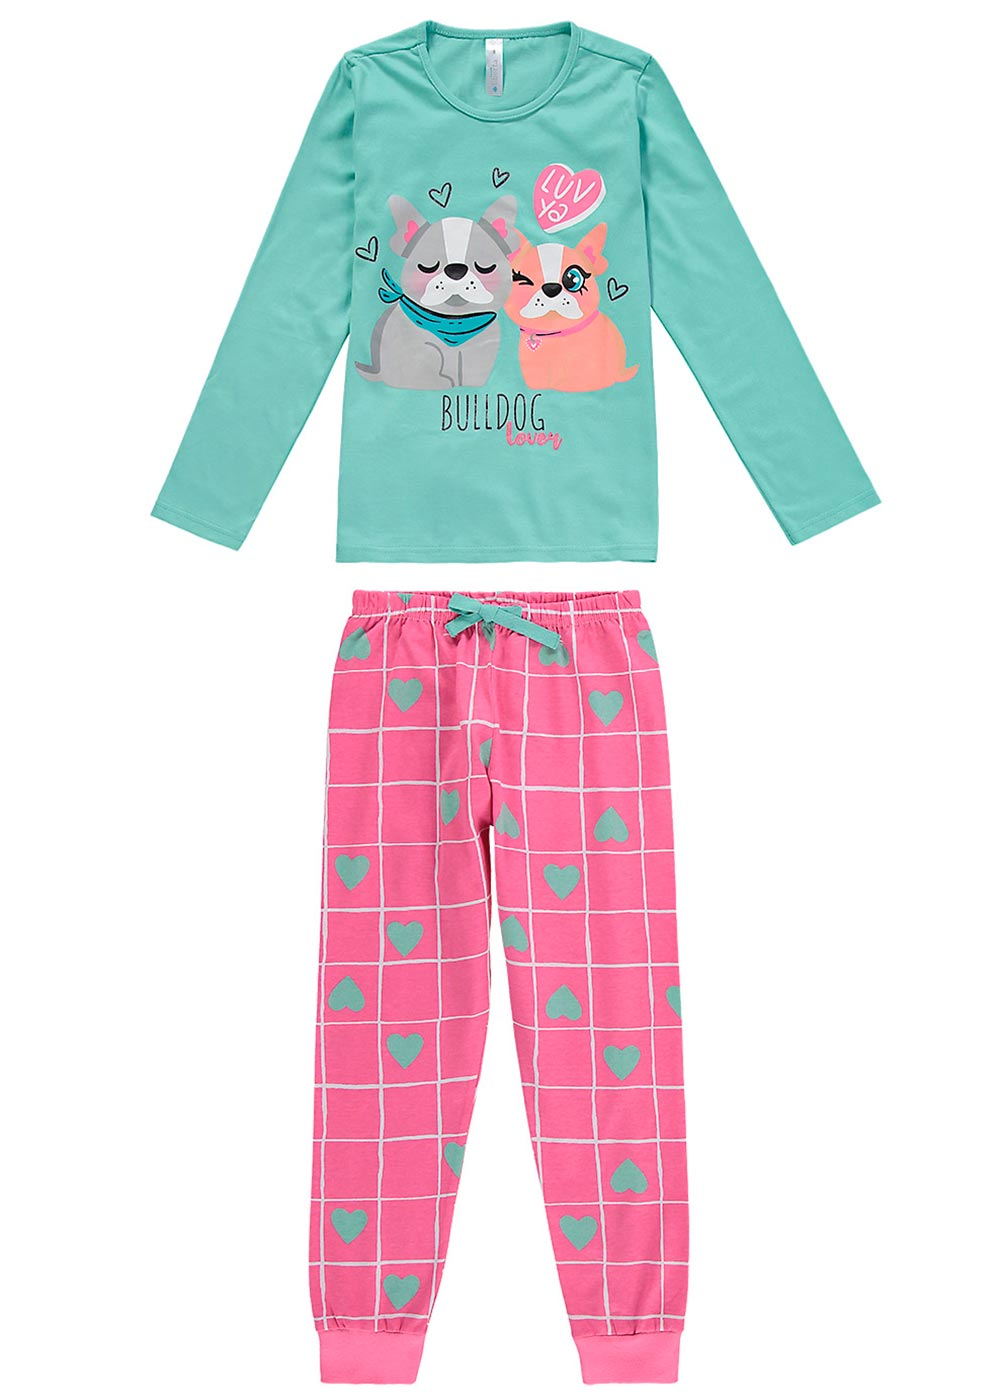 Pijama Infantil Feminino Inverno Azul Bulldog Lover - Malwee